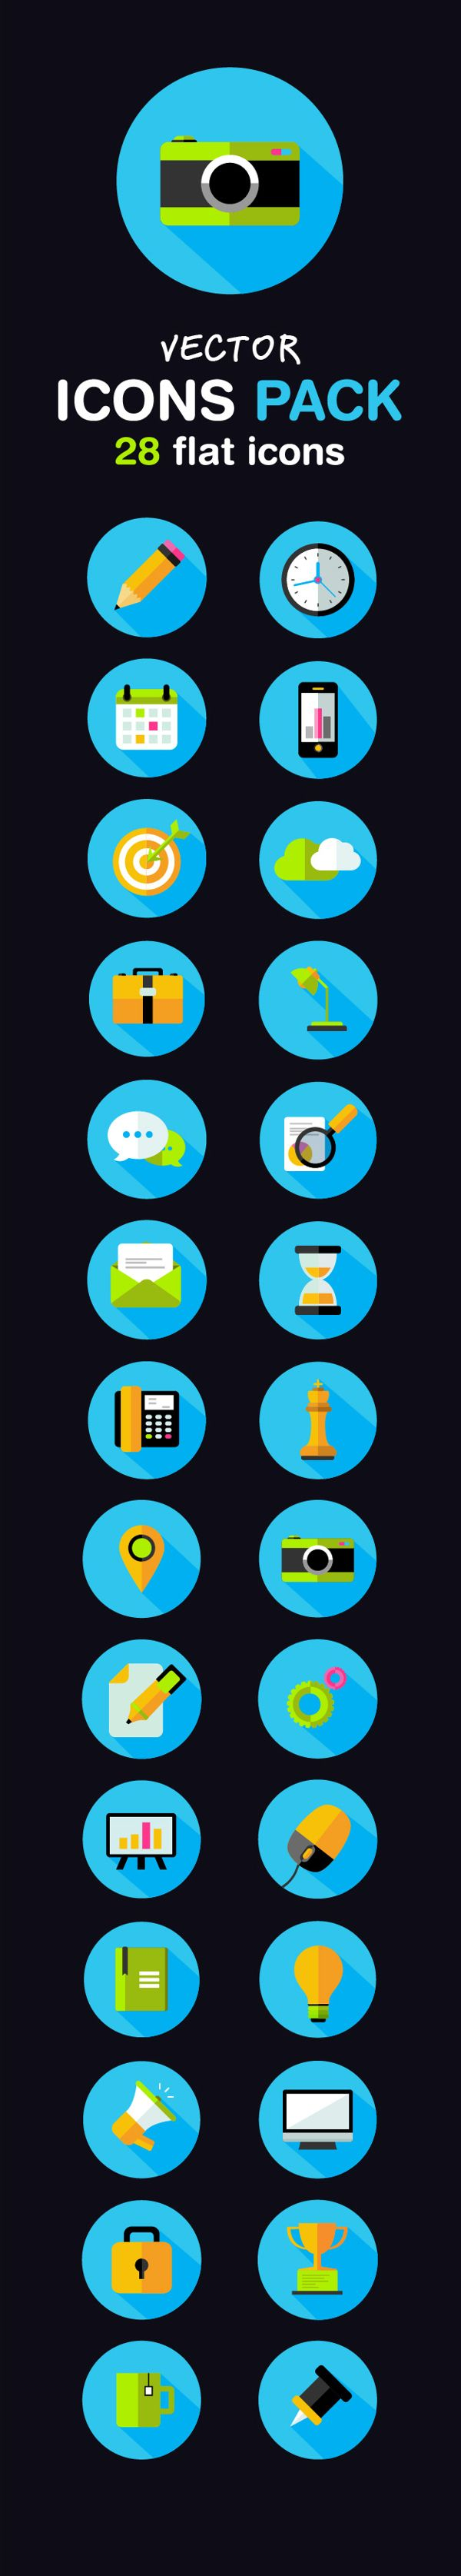 Free Flat Icons Pack by Alex Wishnewsky, via Behance